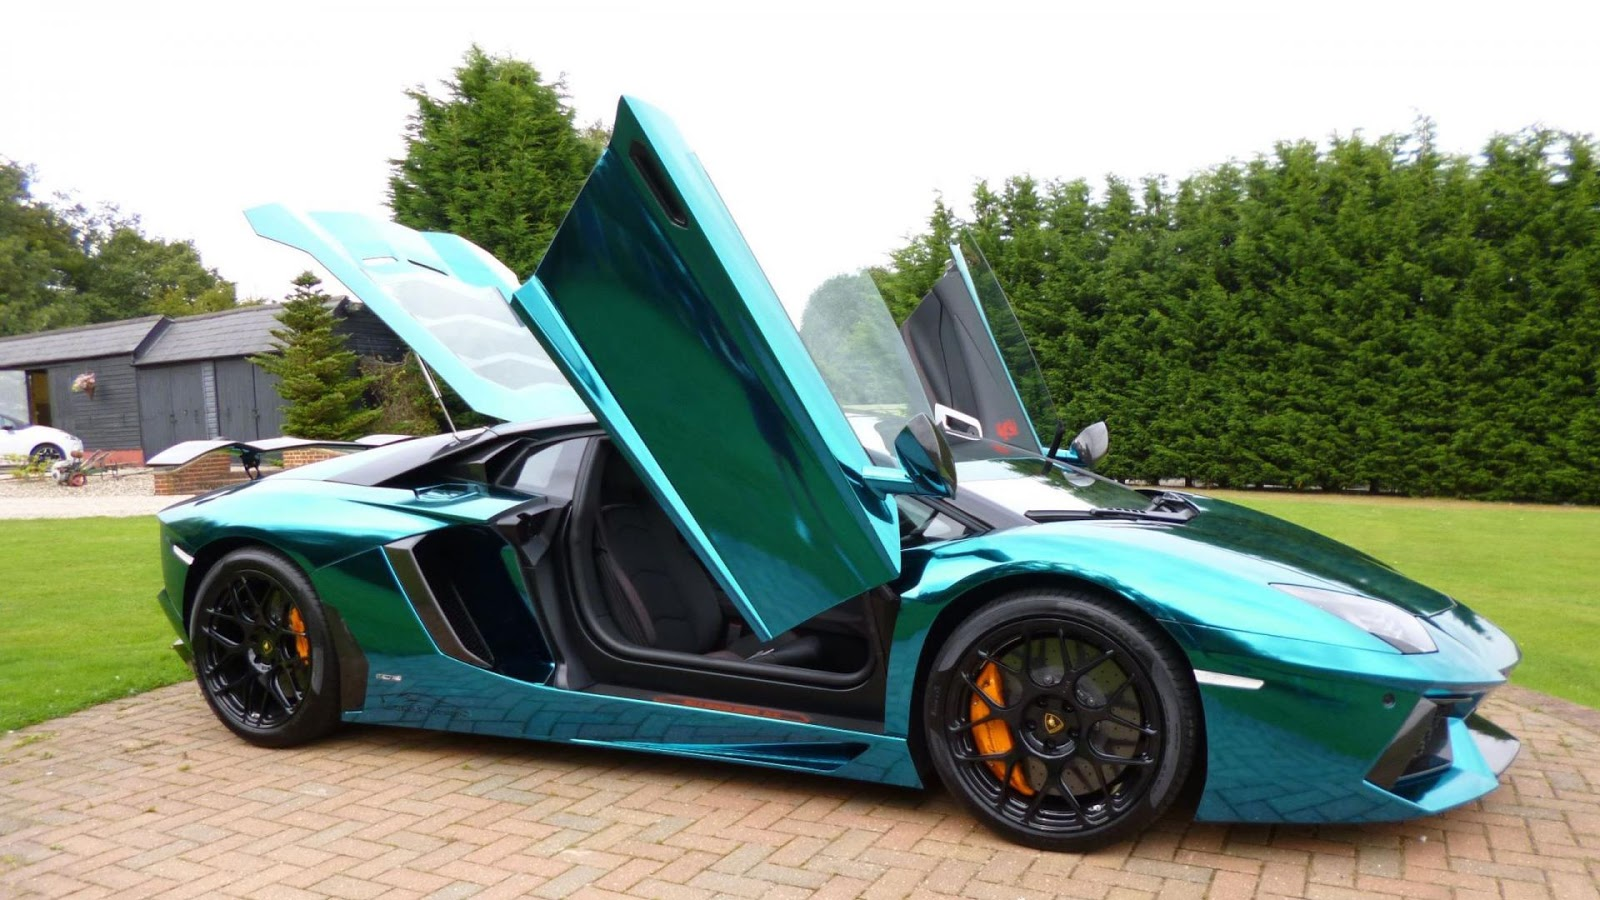 Luxury Lamborghini Cars: Lamborghini Aventador Dragon Edition